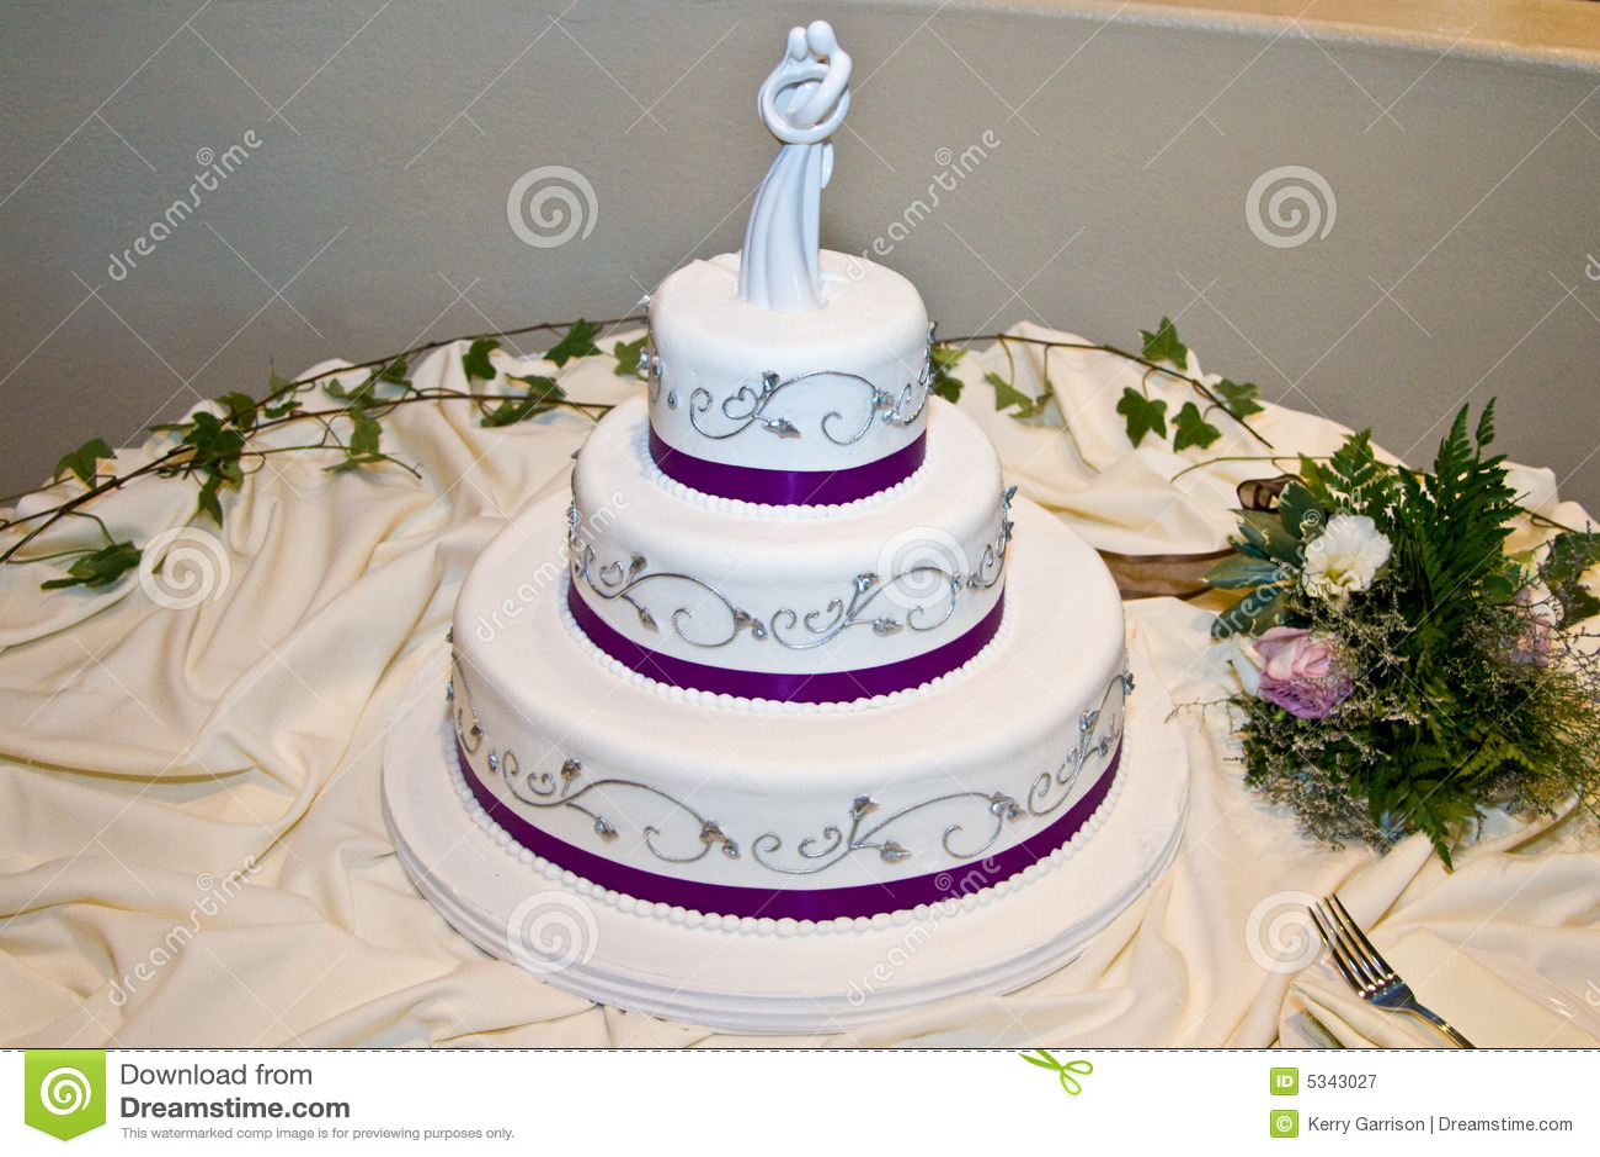 Wedding Cake With Purple Trim Royalty Free Stock